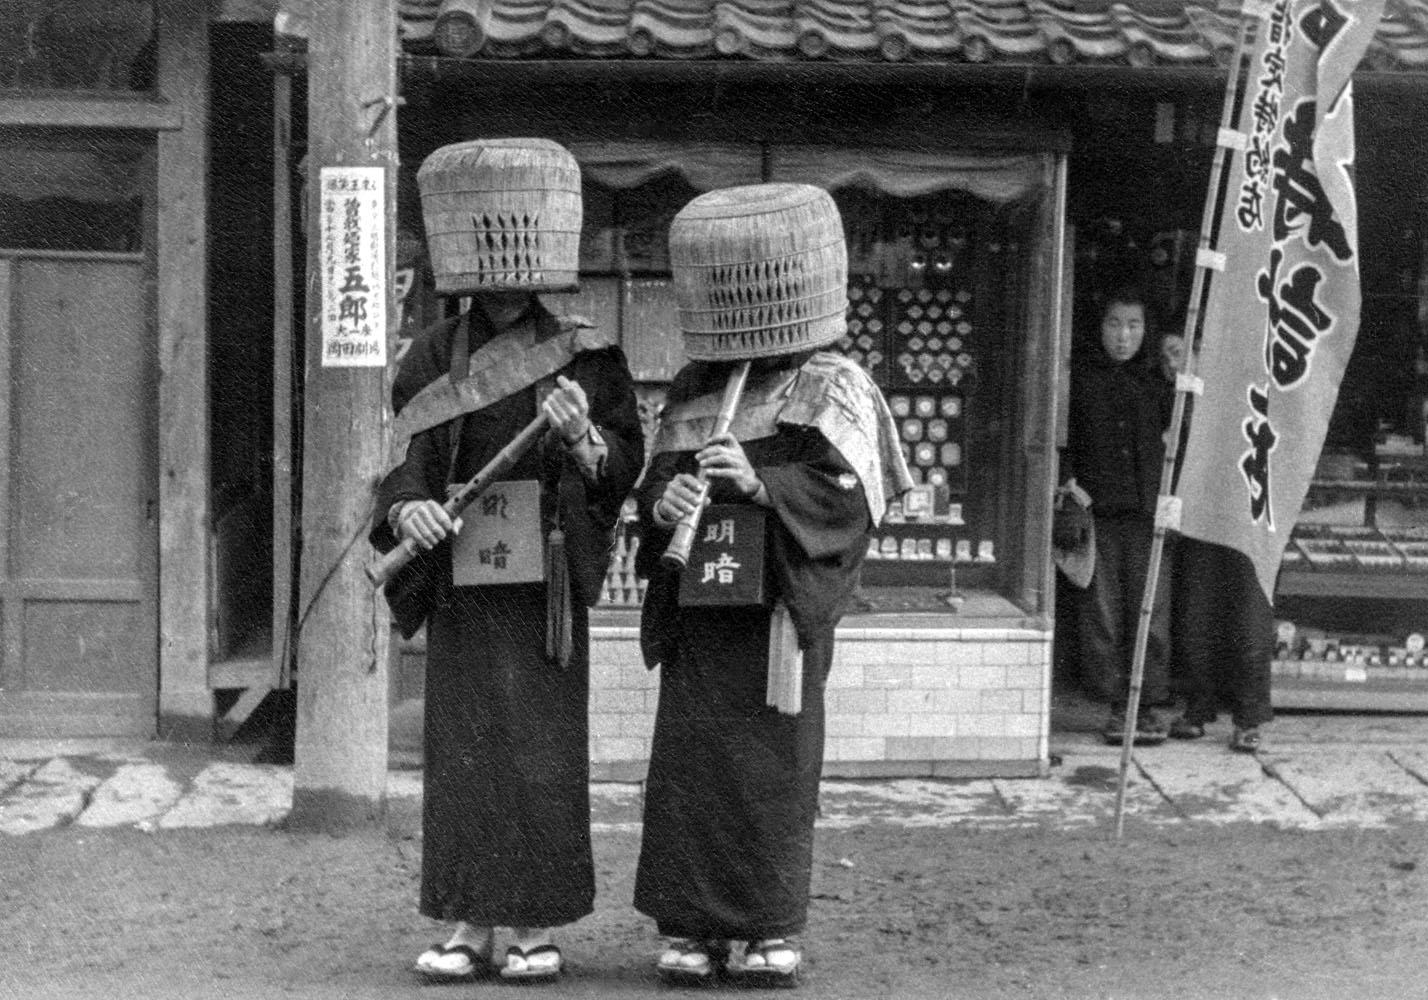 291-Monks w Shakuhaci Flutes-fr Kyoto.jpg